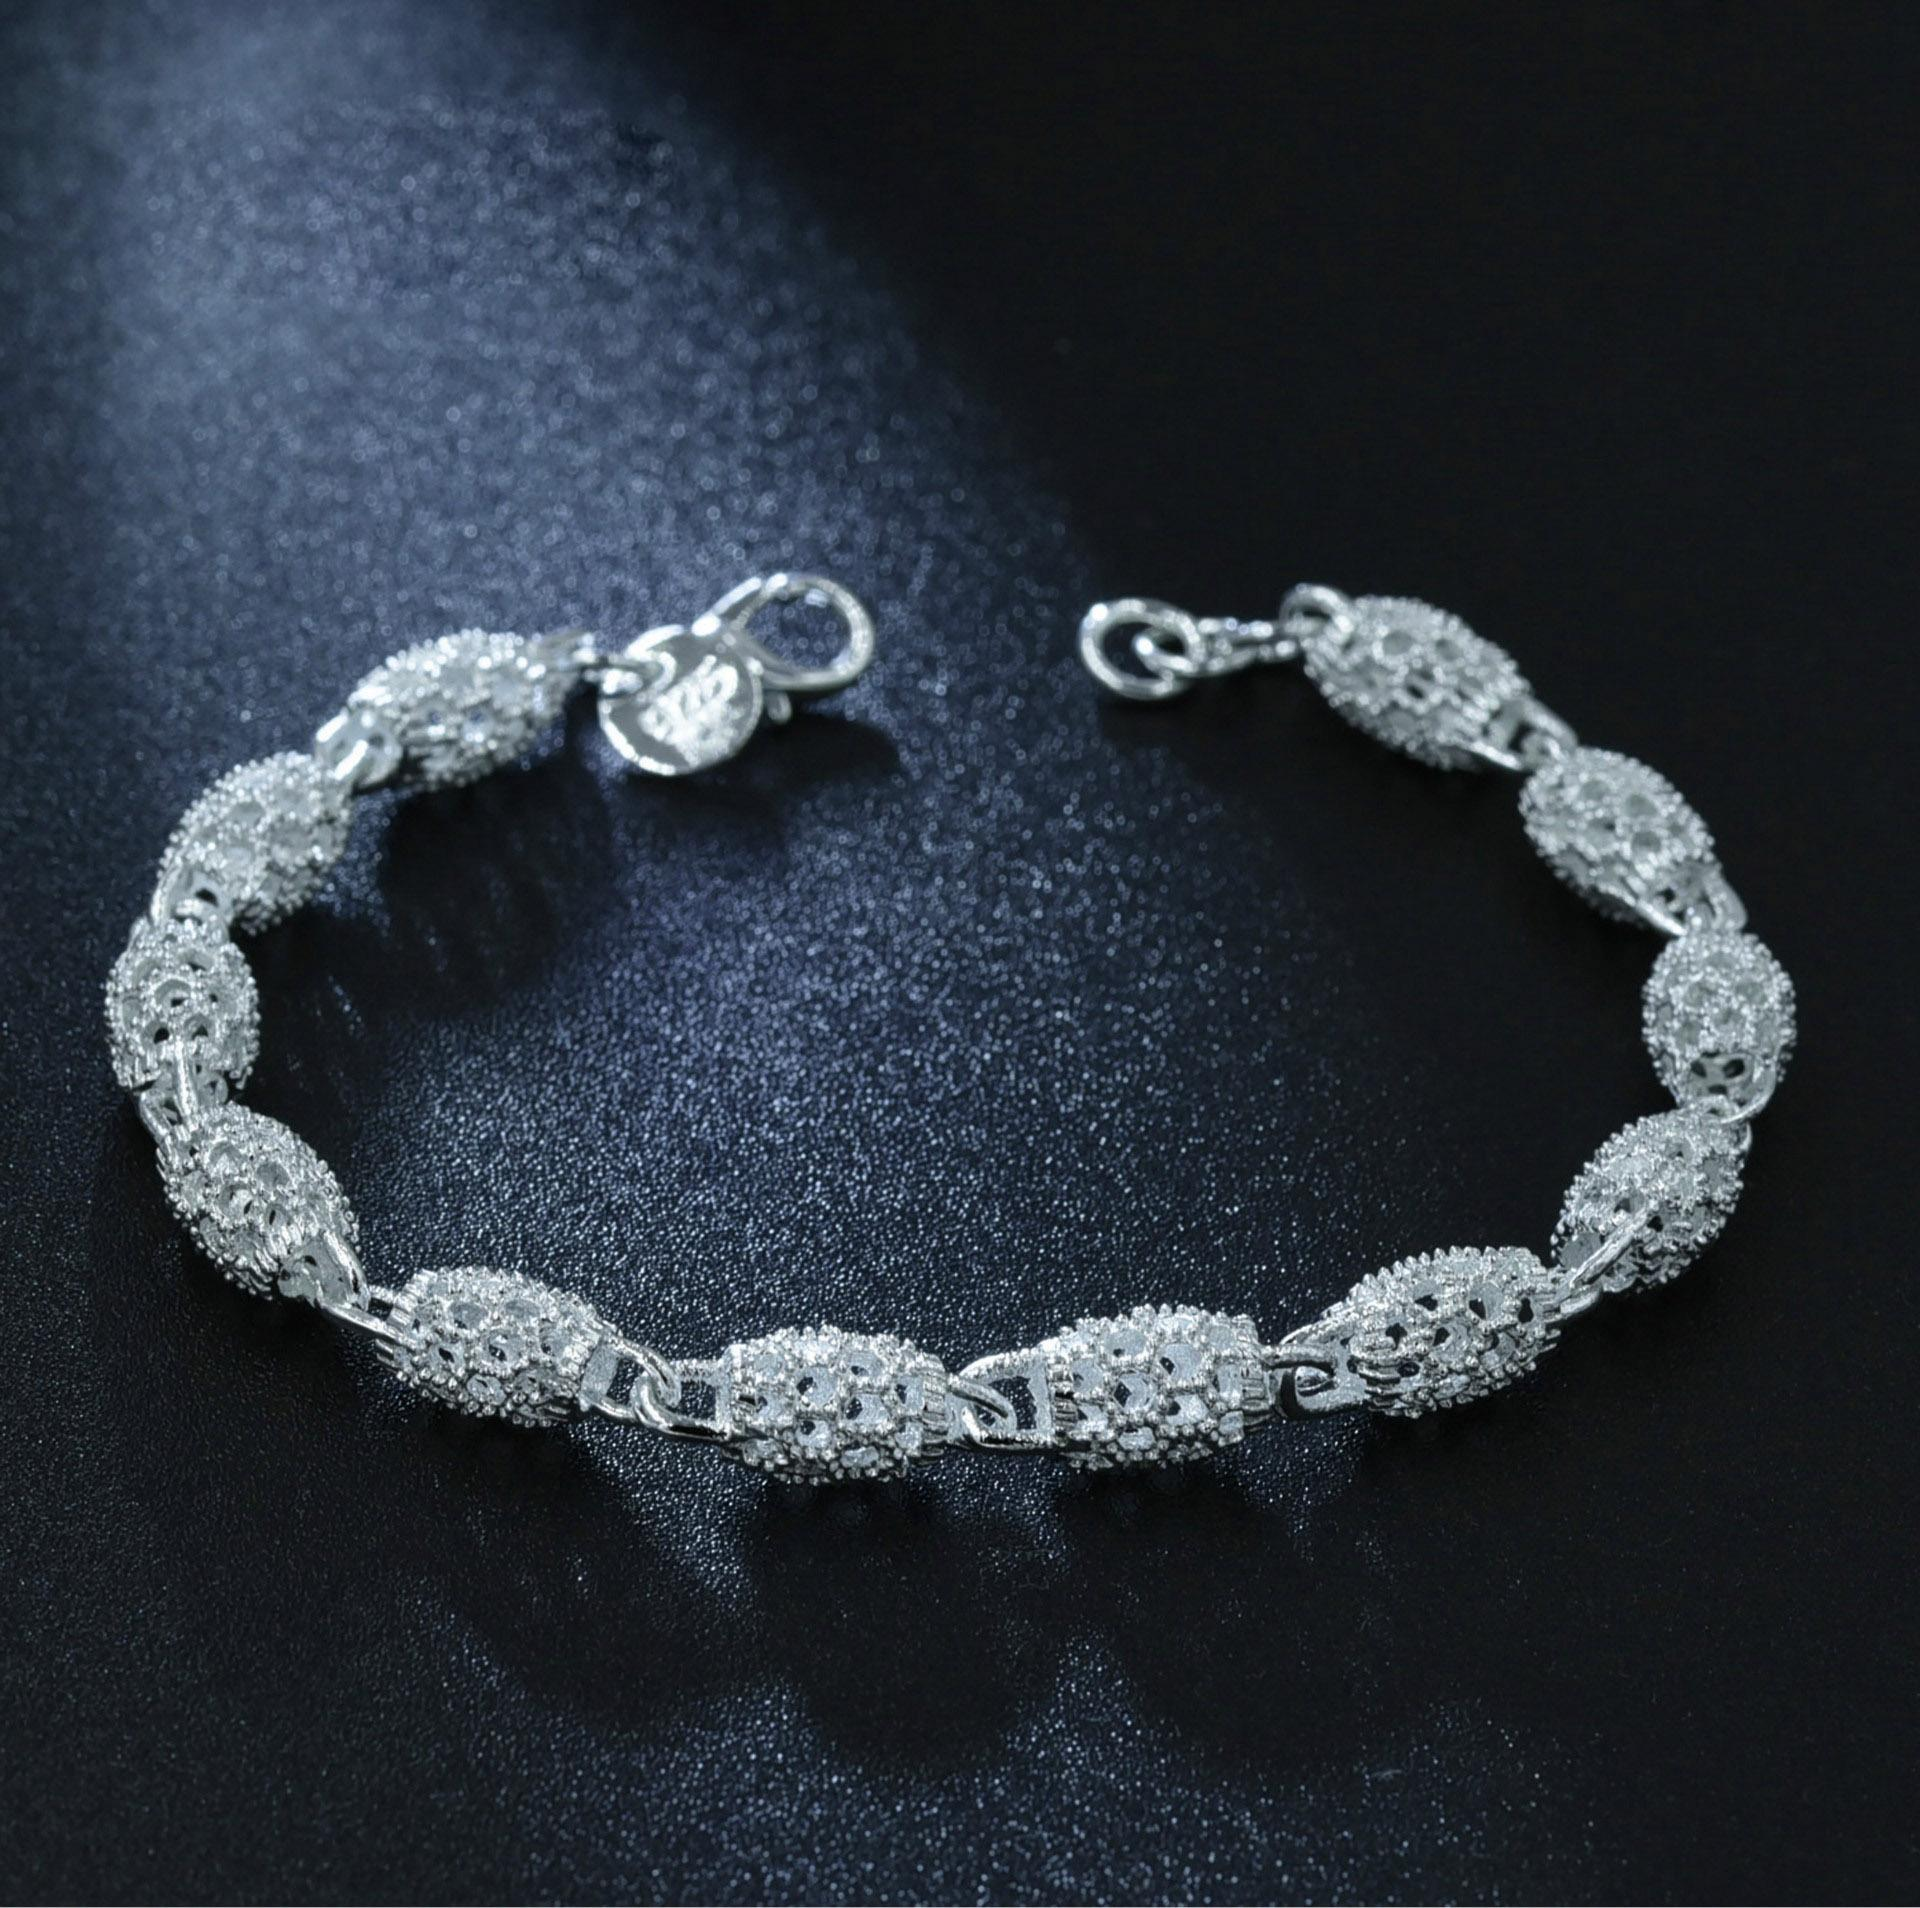 Luxury Bracelet For Women Color Silver Bracelets Bridal Wedding Fine Jewelry Gift Charms Bracelets